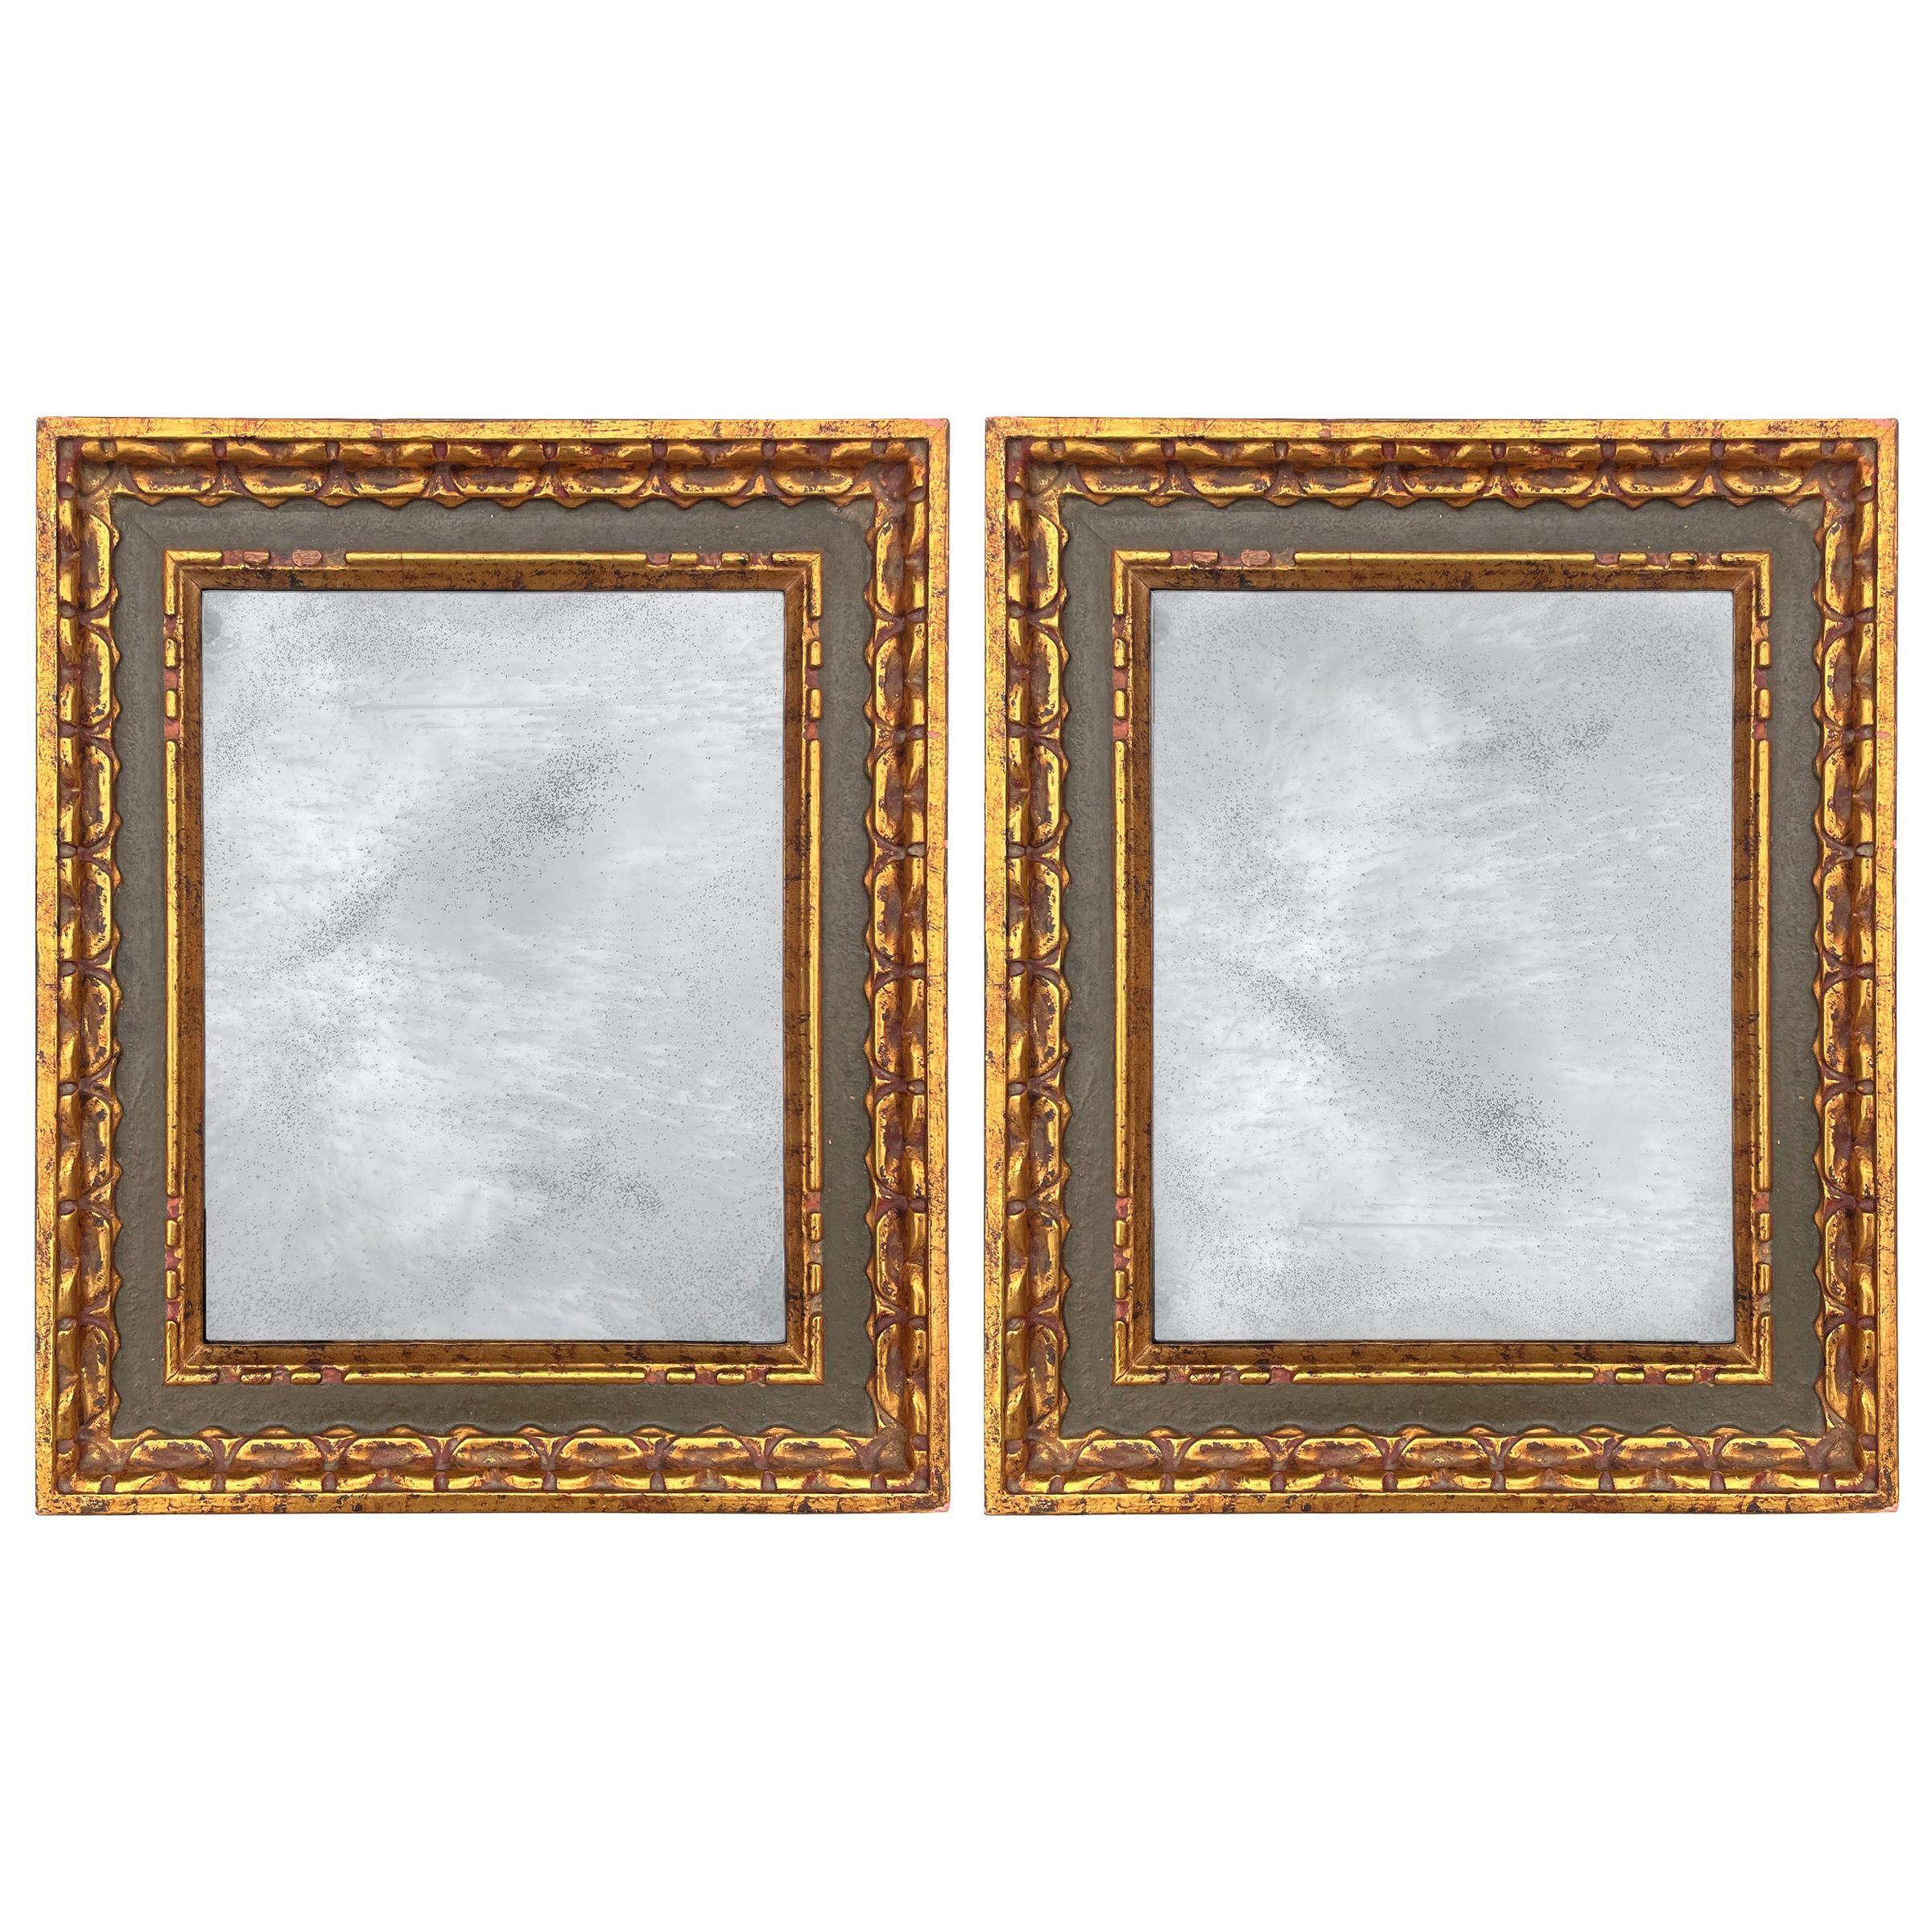 Pair of 19th Century Italian Gilt Wood Framed Mirrors